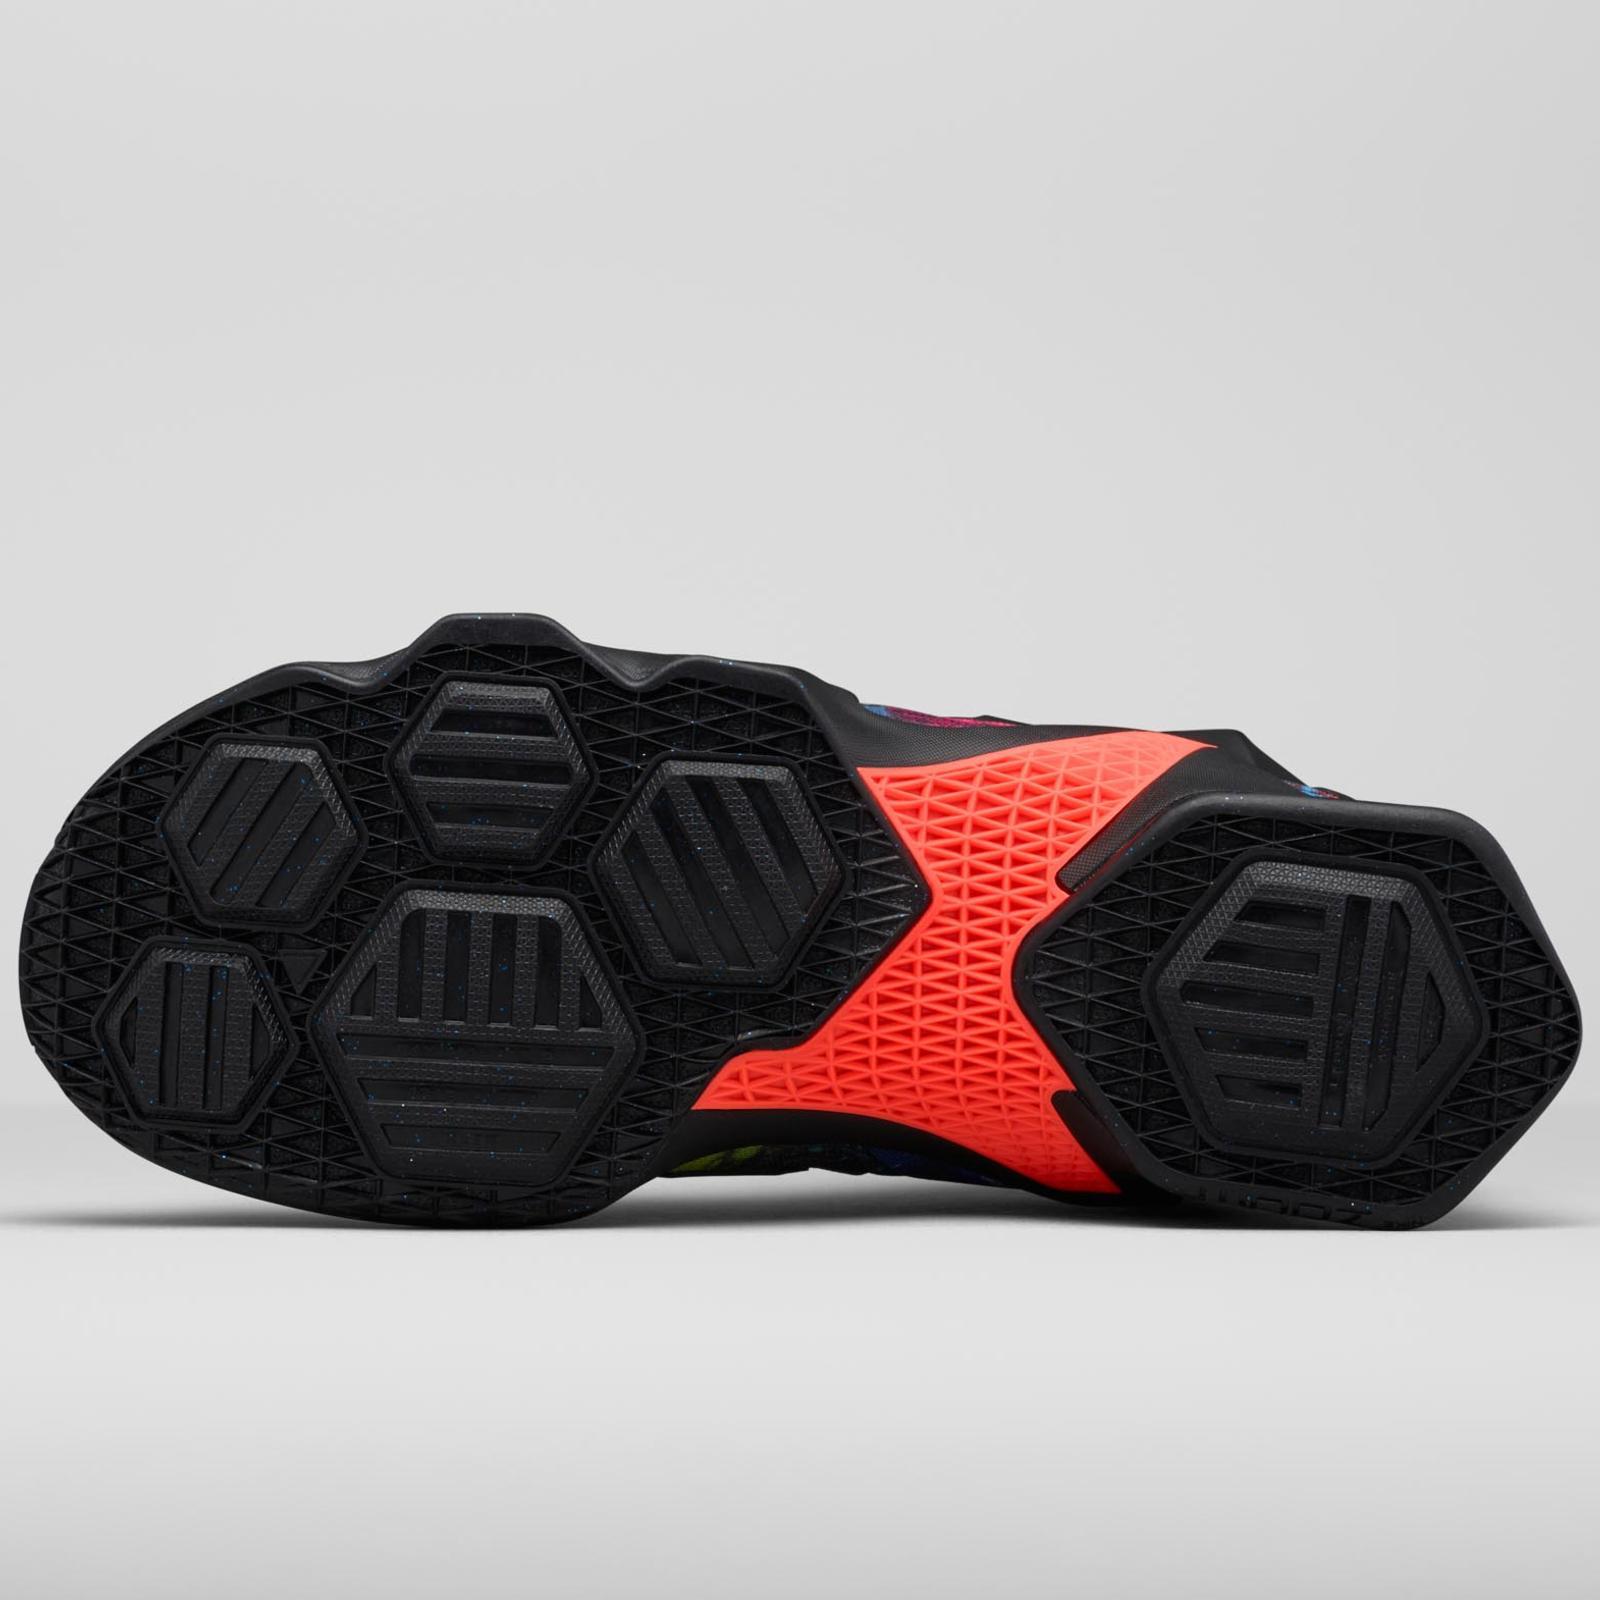 ef180ba2600 Introducing the LEBRON 13 Akronite Philosophy Shoe - Nike News